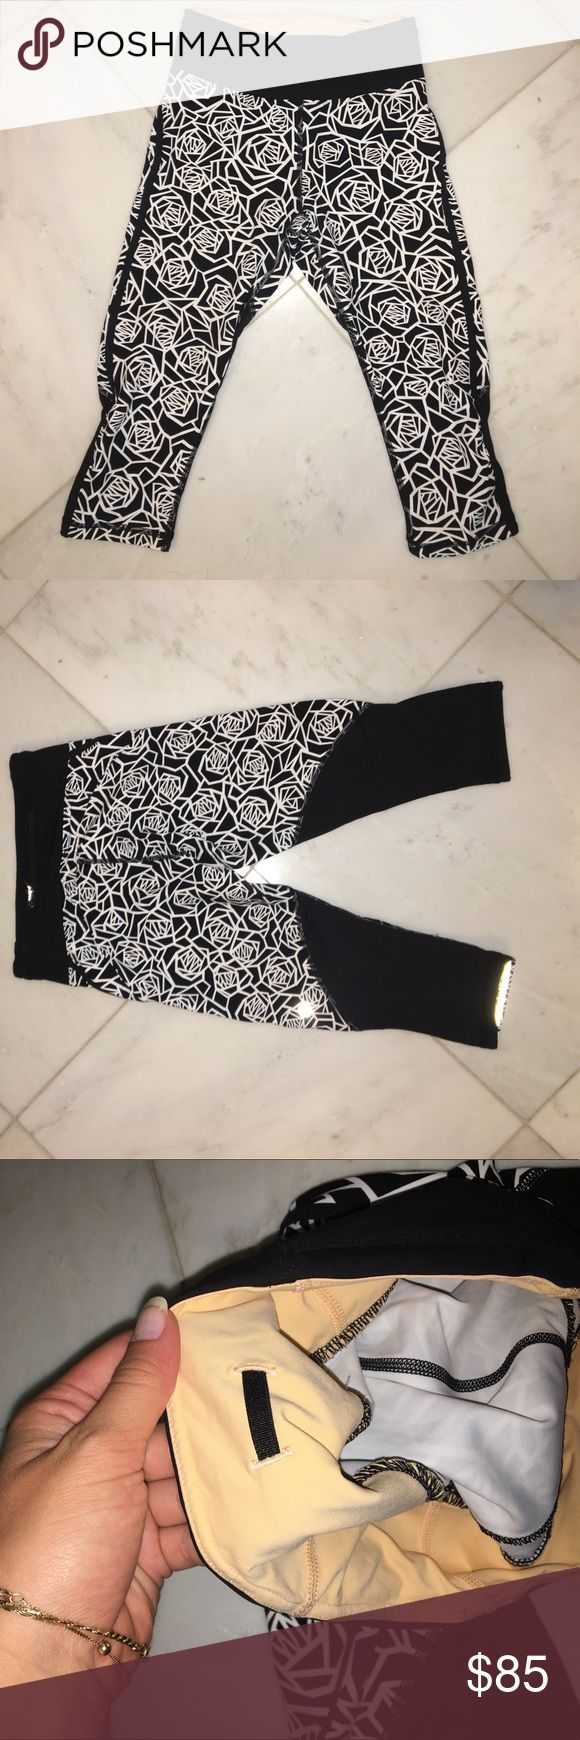 Lulu lemon leggings Size 4 lulu lemon patterned legging* BUNDEL DISCOUNTS - WILLING TO NEGOTIATE* lululemon athletica Pants Leggings